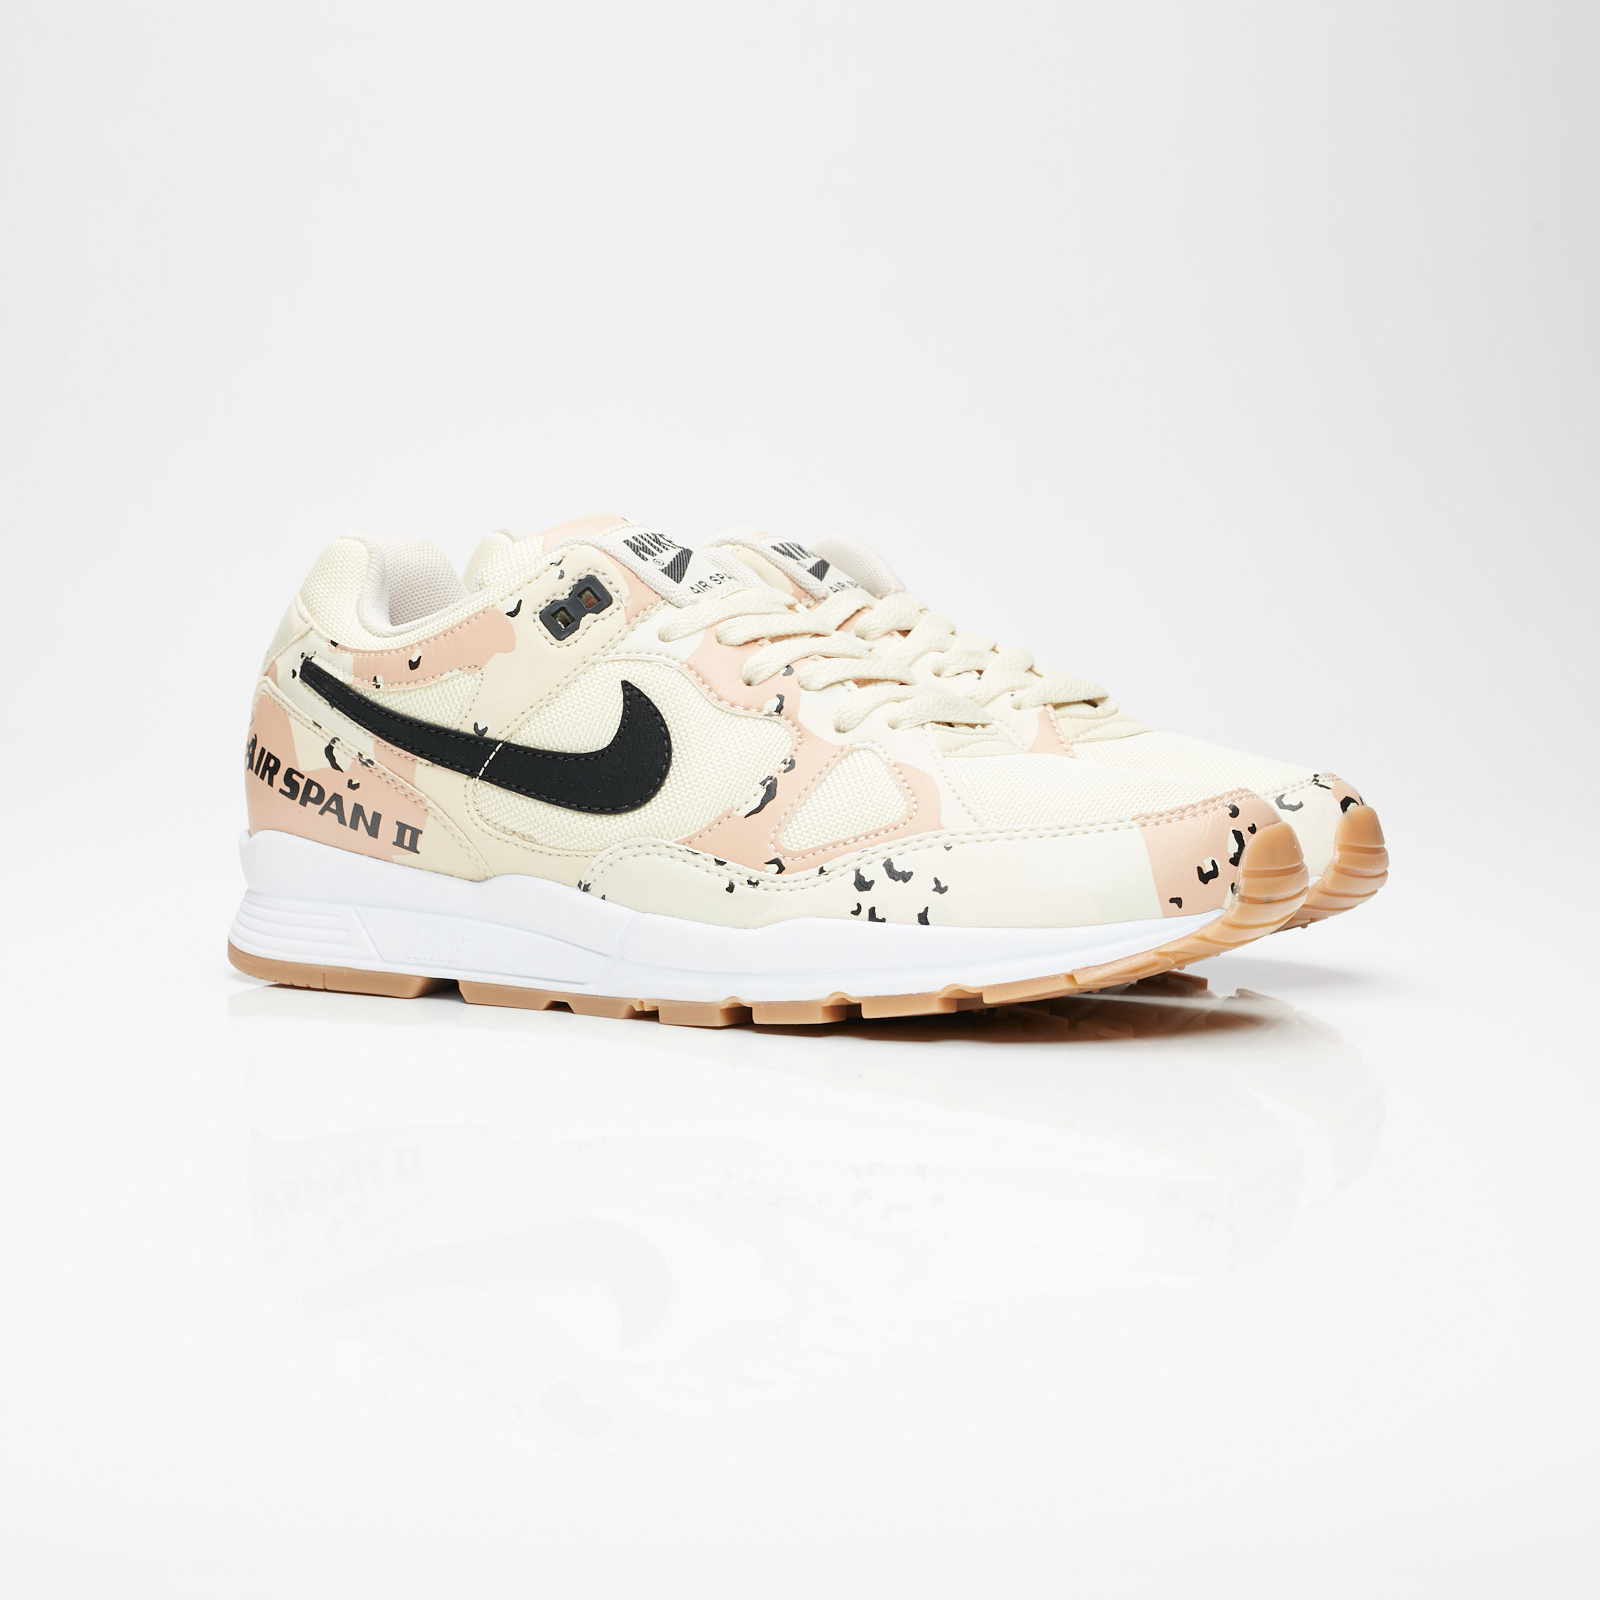 Nike Air Span II Prm - Ao1546-200 - Sneakersnstuff  5a8c8103e